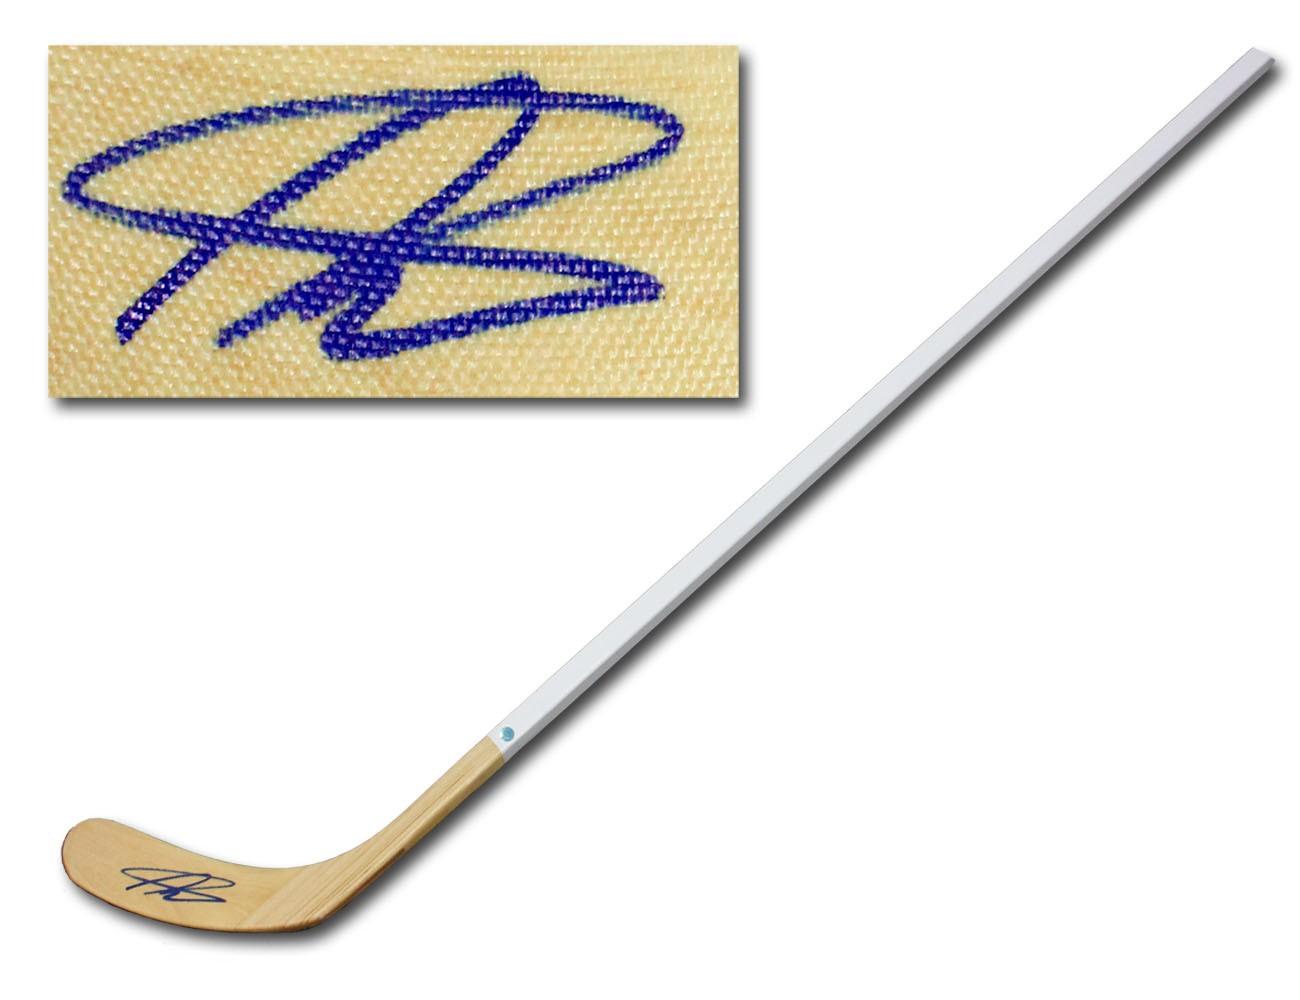 2b8a6e958 Nolan Patrick Autographed Signed Wood Hockey Stick - Philadelphia Flyers -  Certified Authentic